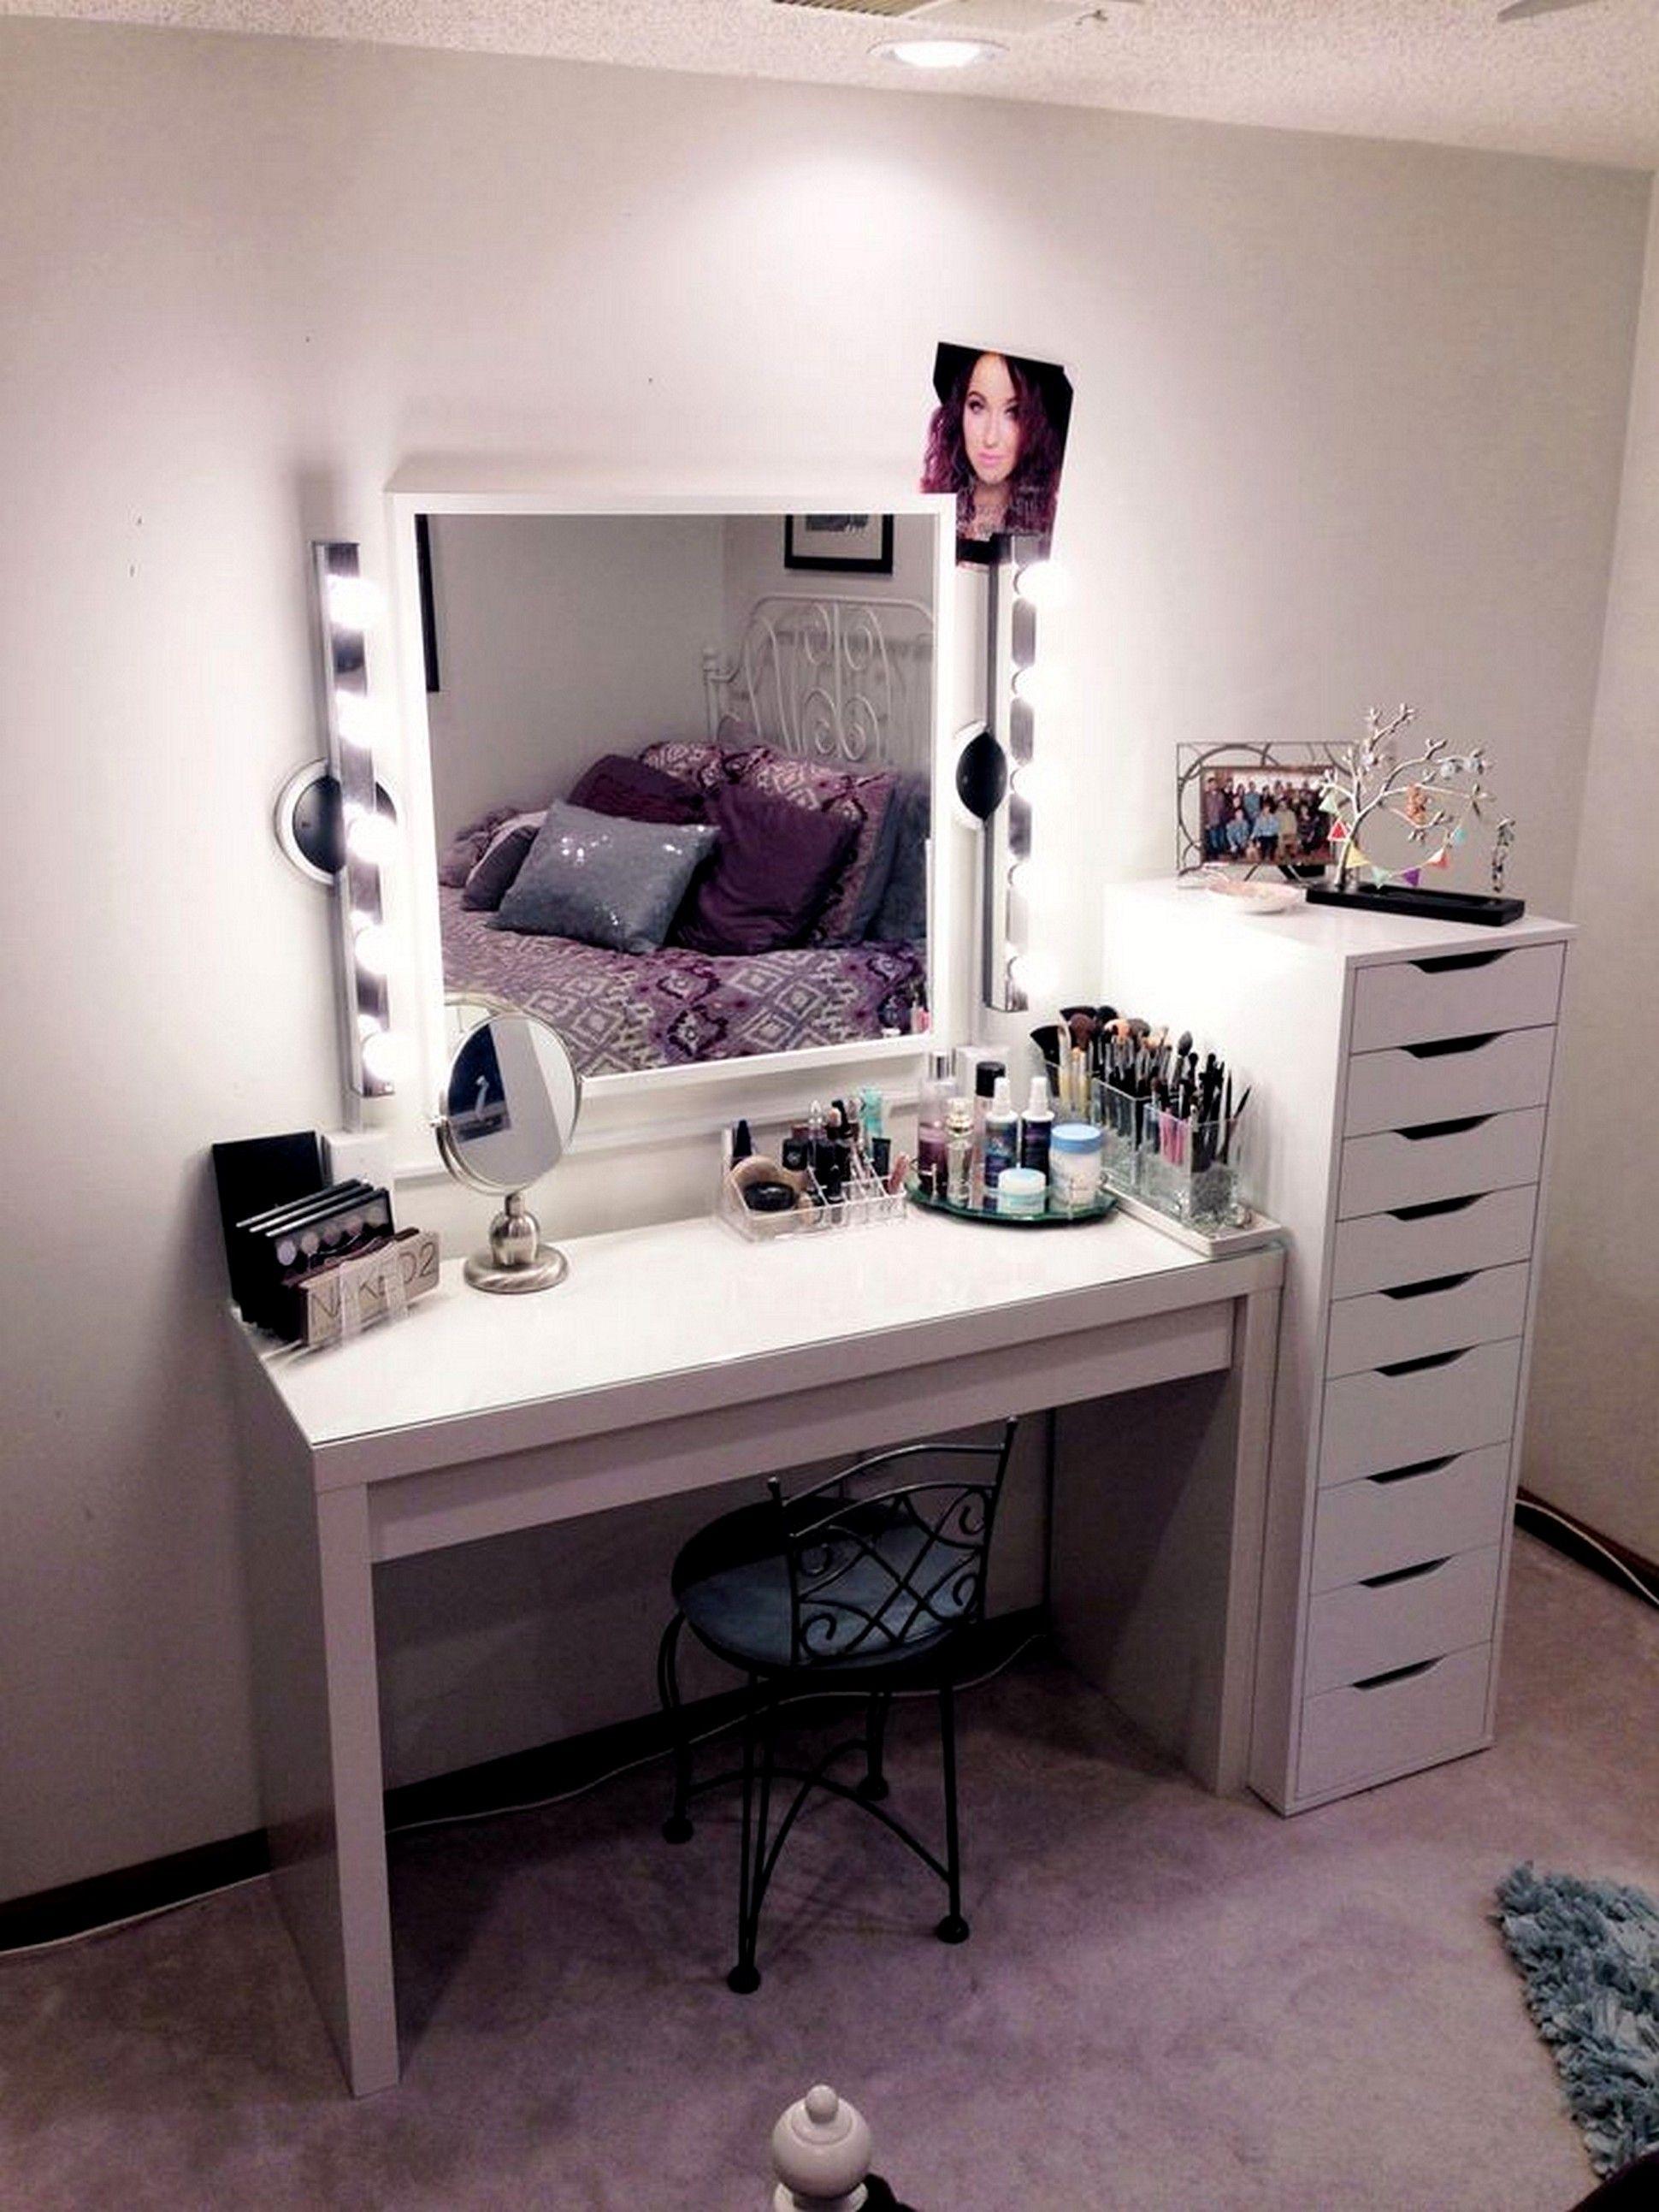 Diy Vanity Mirror W Lights 4theloveofkelz Diyvanitymirroranddesk Ikea Vanity Makeup Table Vanity Makeup Beauty Room